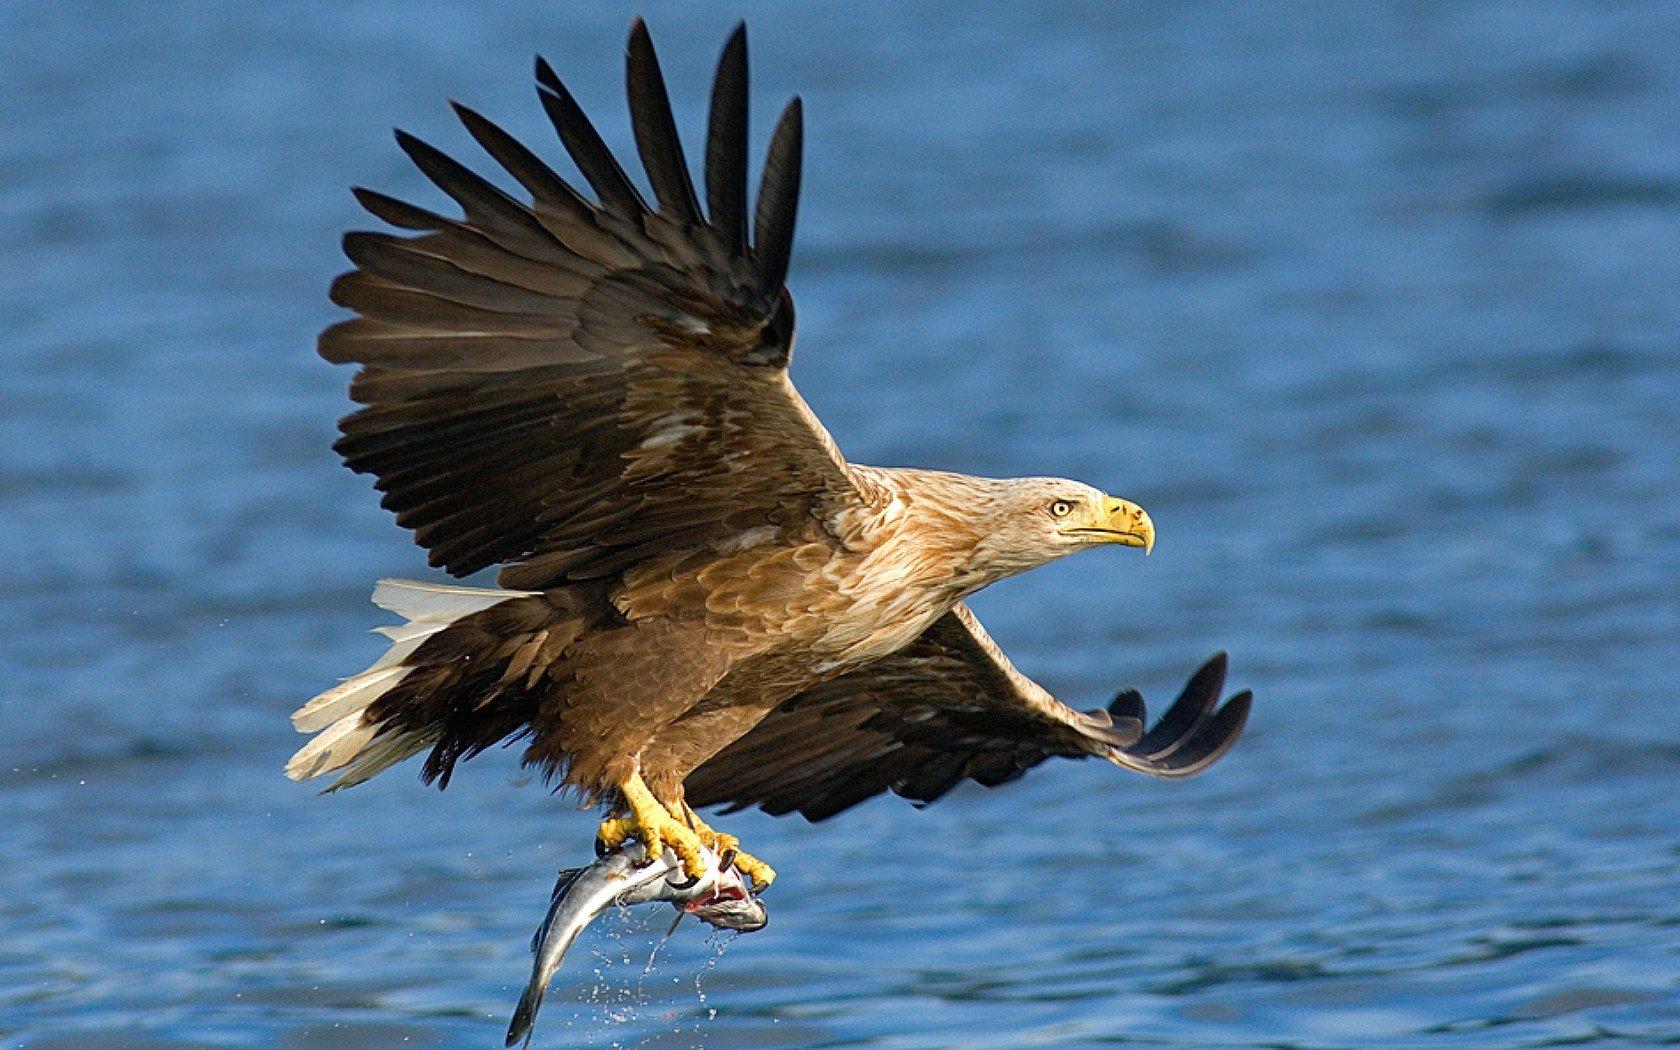 nature birds prey bald eagles hunting sea wallpaper background 1680x1050